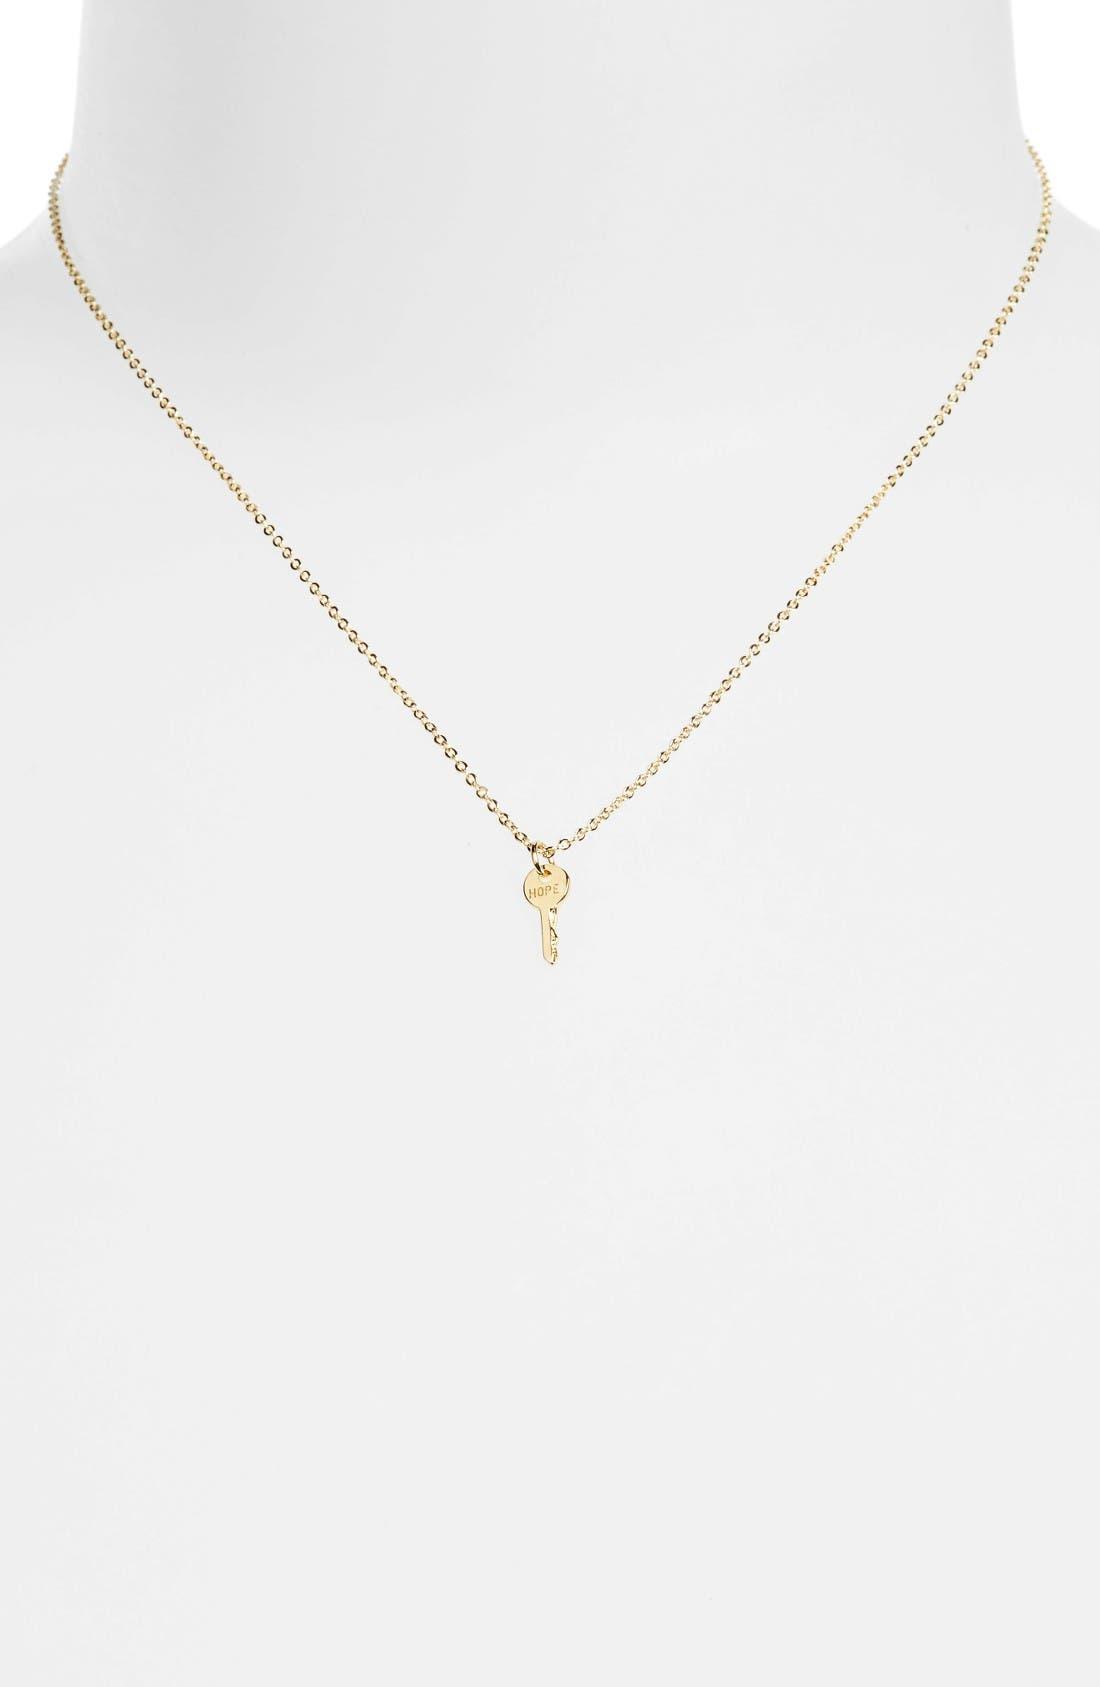 The Giving Keys Hope Mini Key Necklace